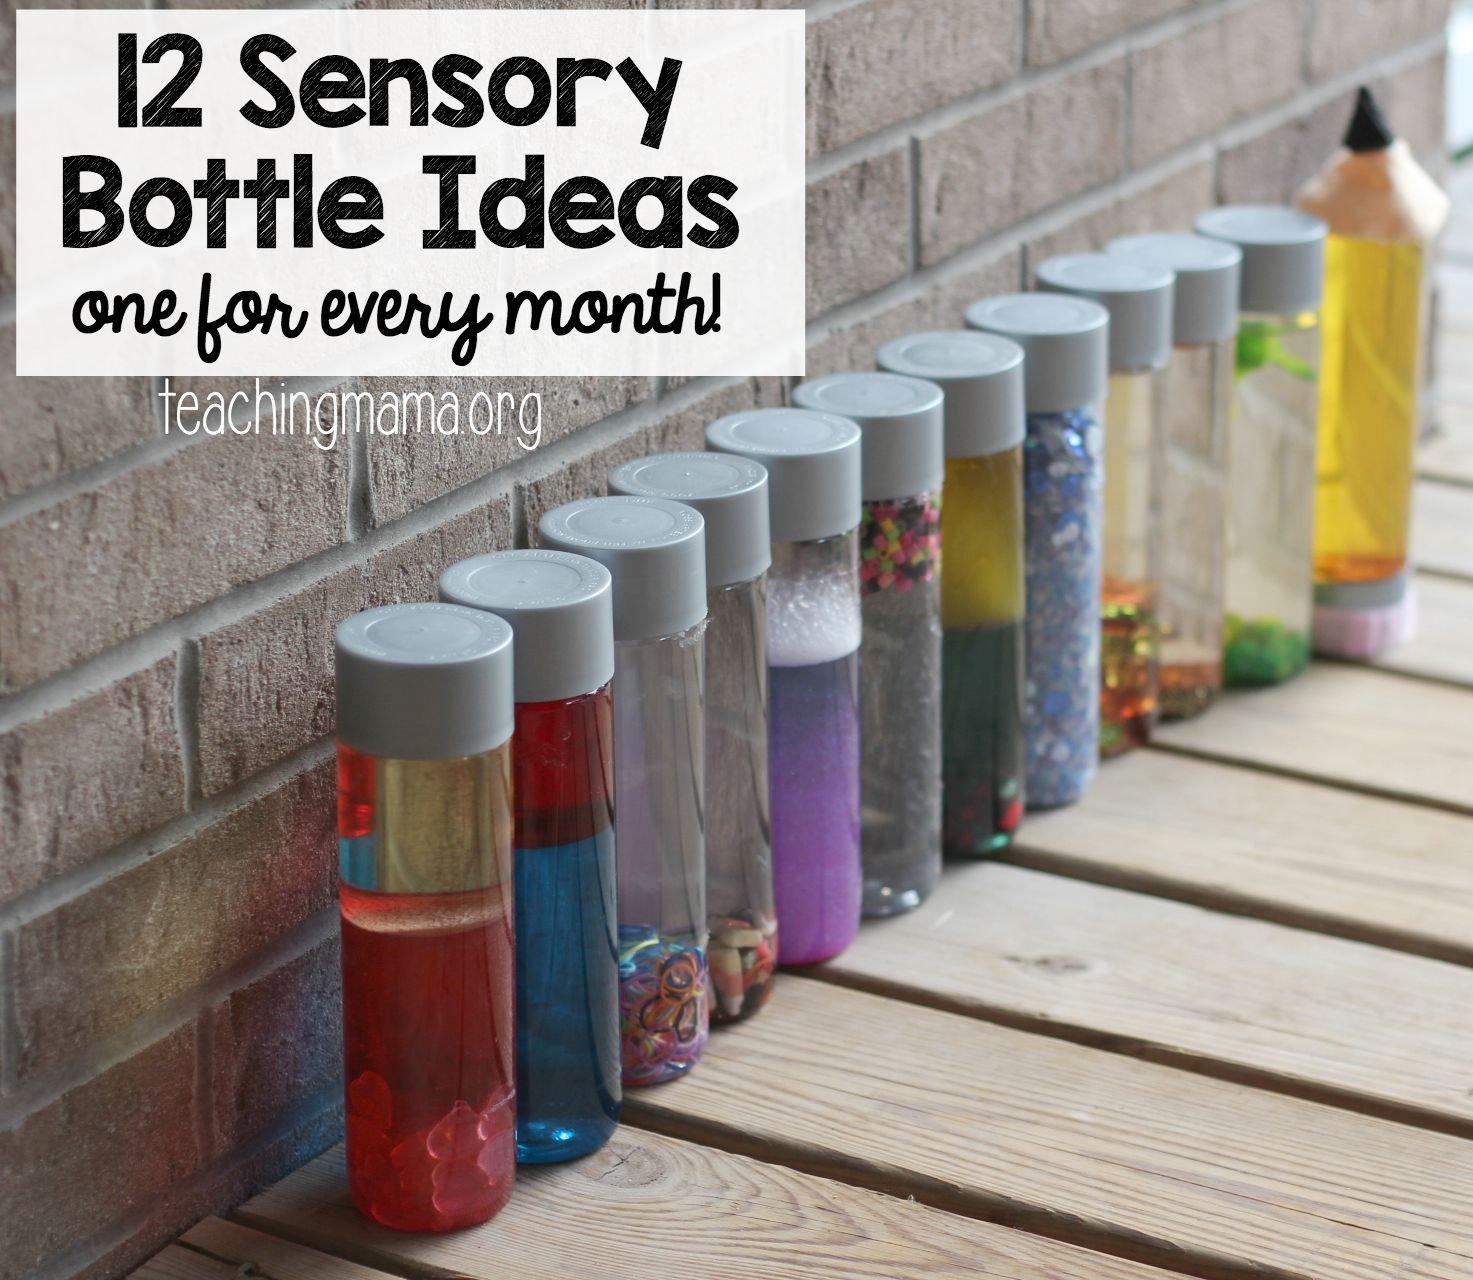 12 sensory bottle ideas